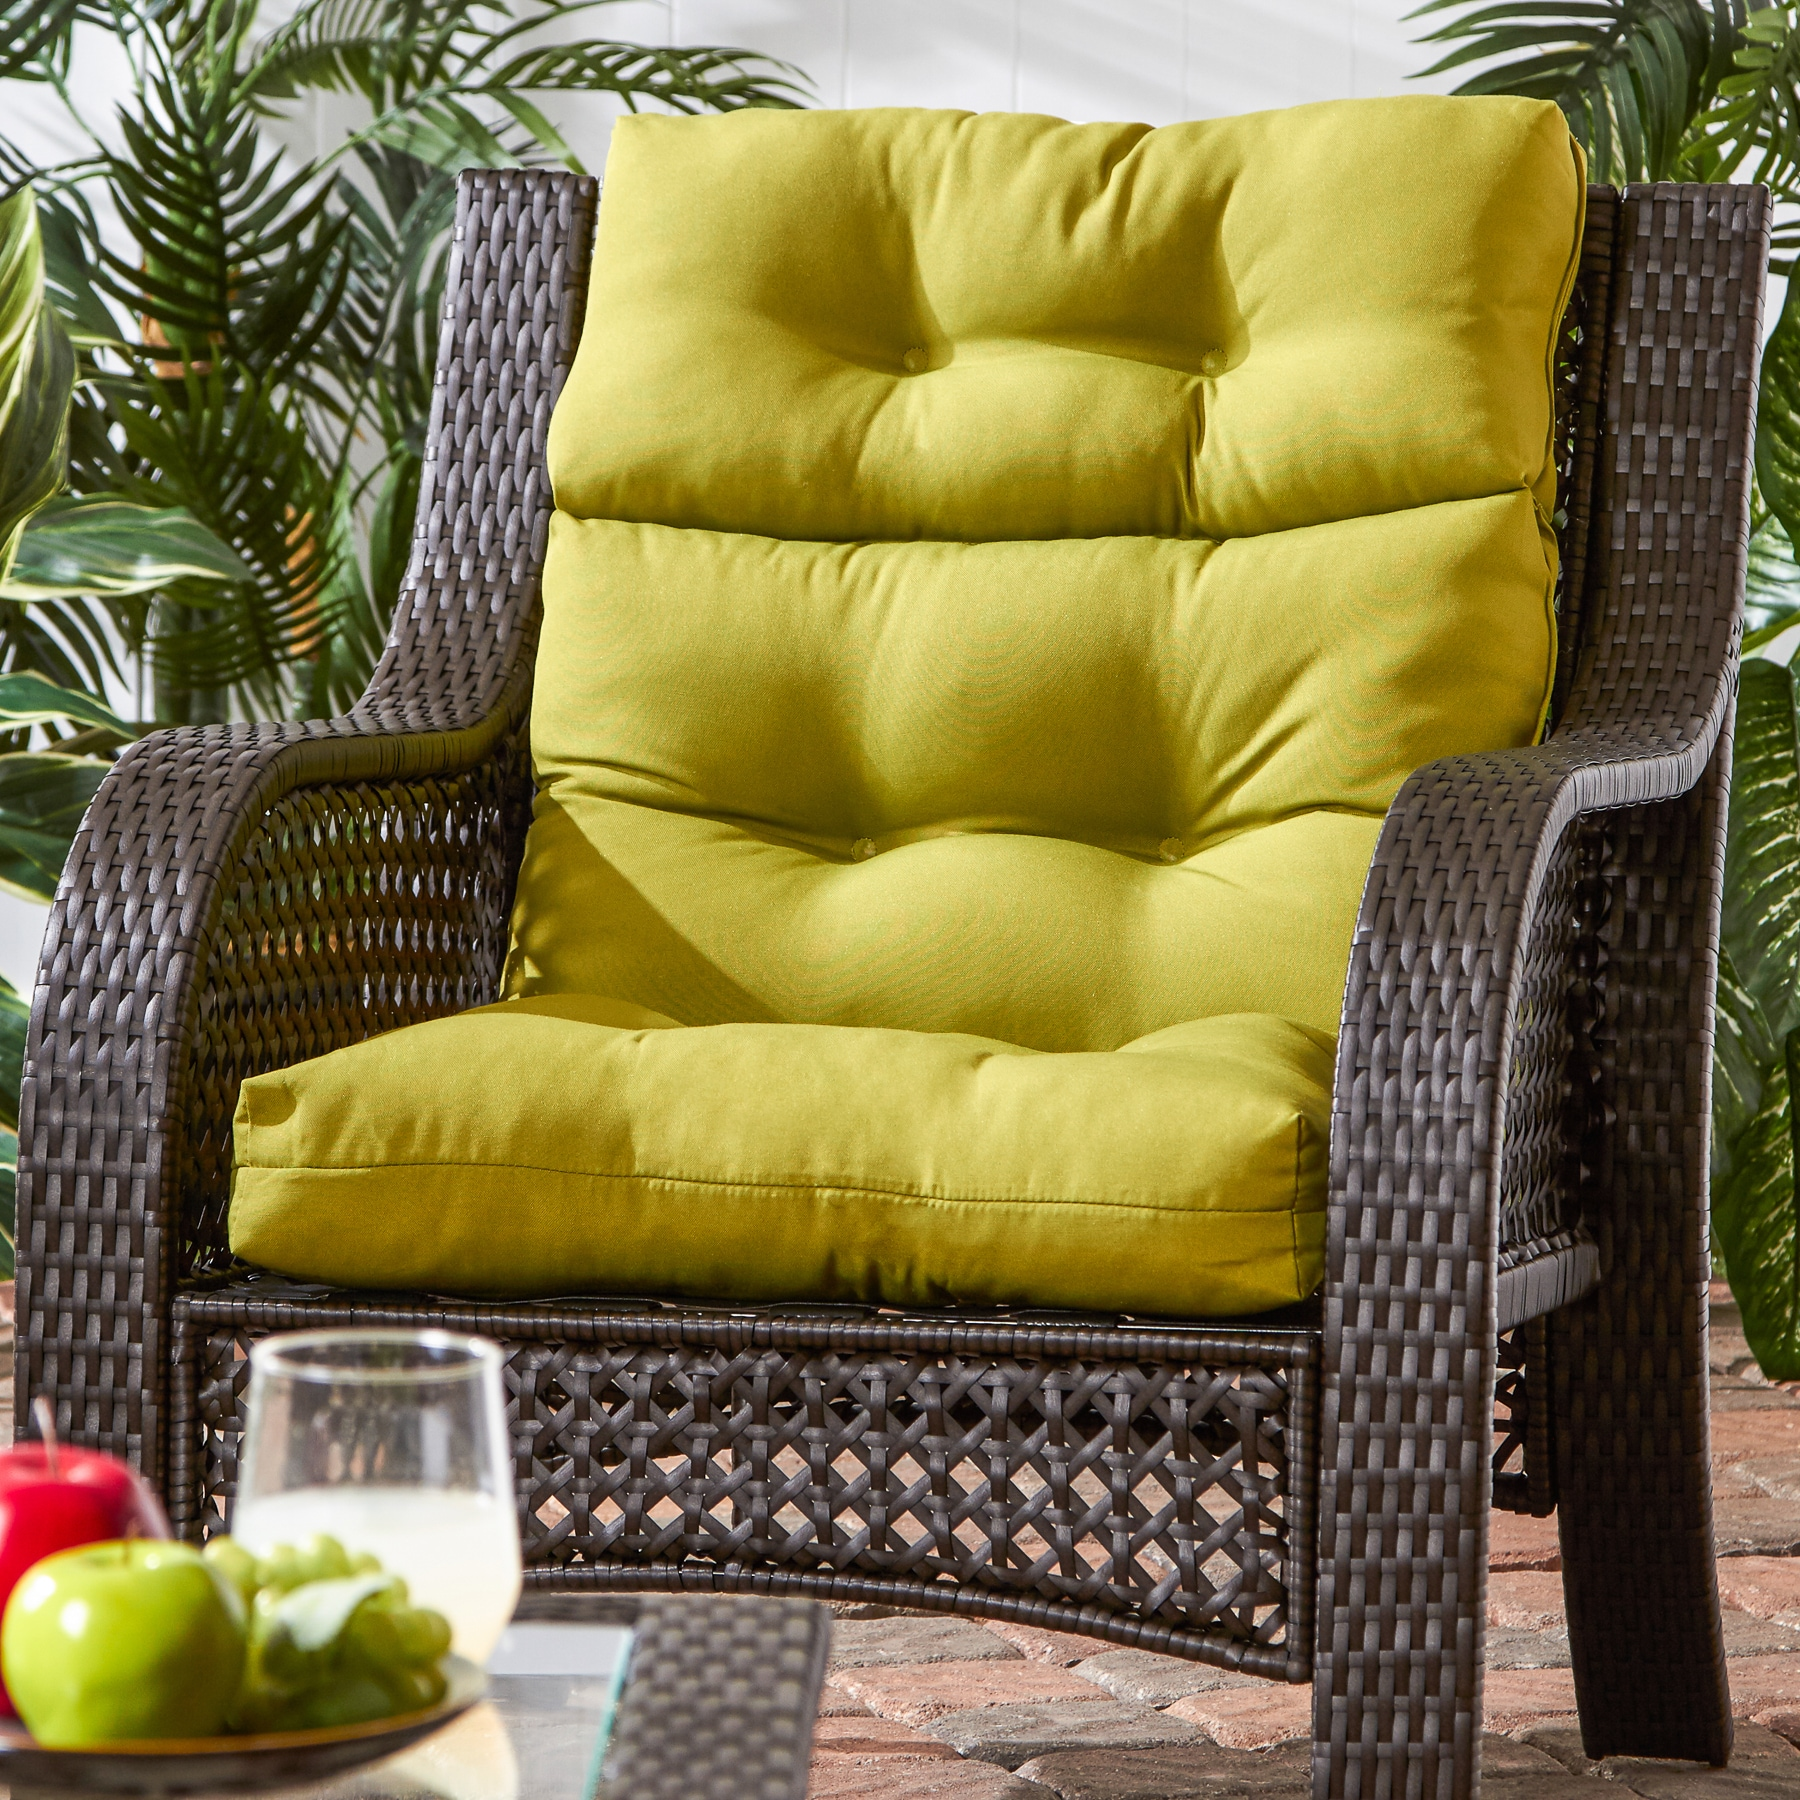 Greendale Home Fashions Kiwi Outdoor High Back Chair Cushion   22w X 44l